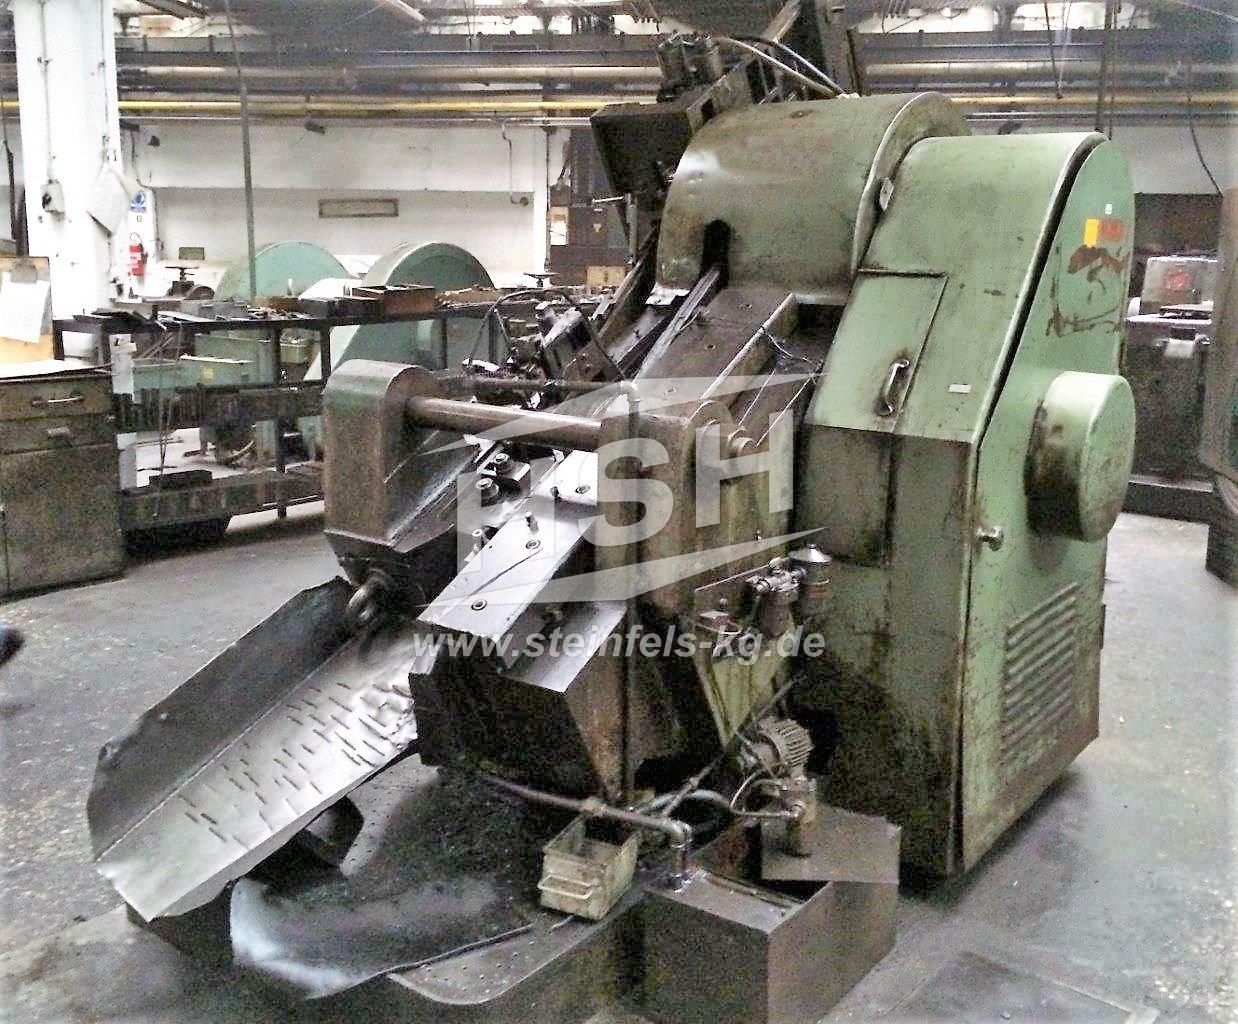 M14E/7361 – PELTZER-EHLERS – NKW K24 – 1968 – 16-27 mm